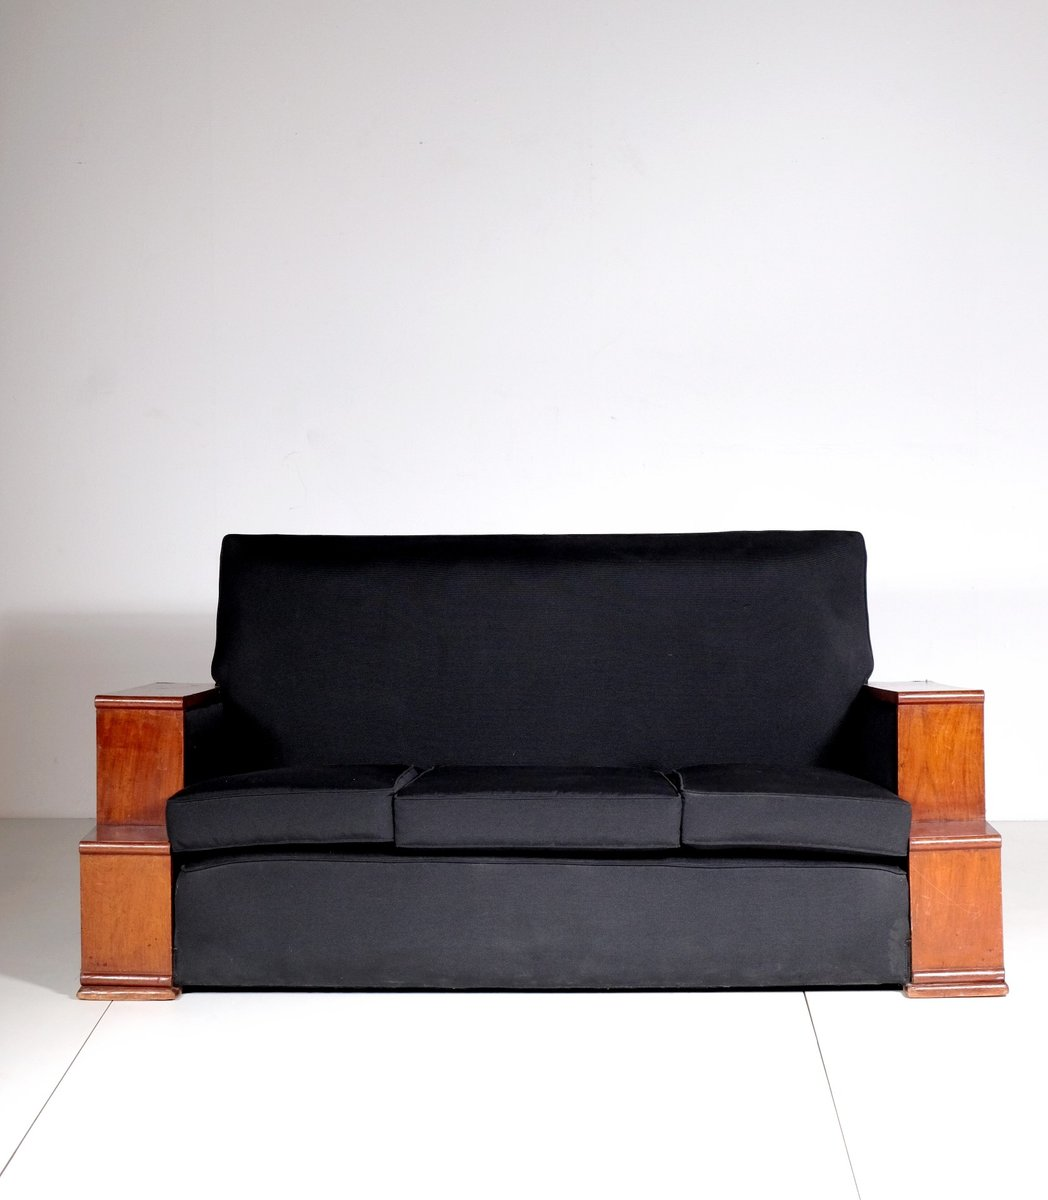 Vintage Art Deco Rosewood And Black Cotton Sofa 1930s